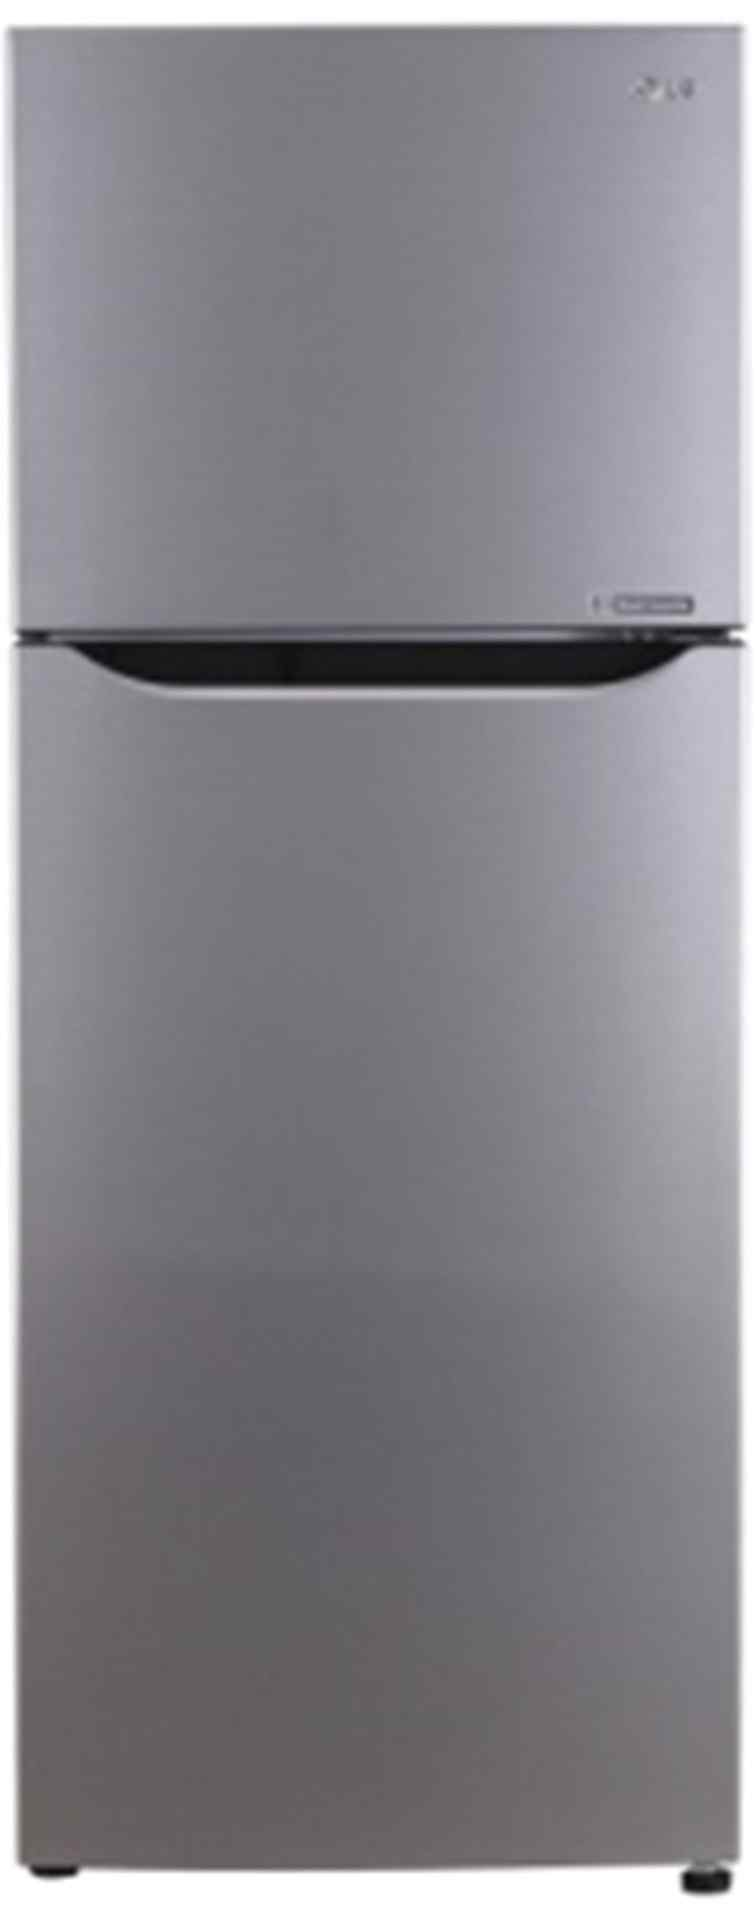 Best price on LG GL-Q282SPZL 255 Litres Frost Free Double Door Refrigerator in India